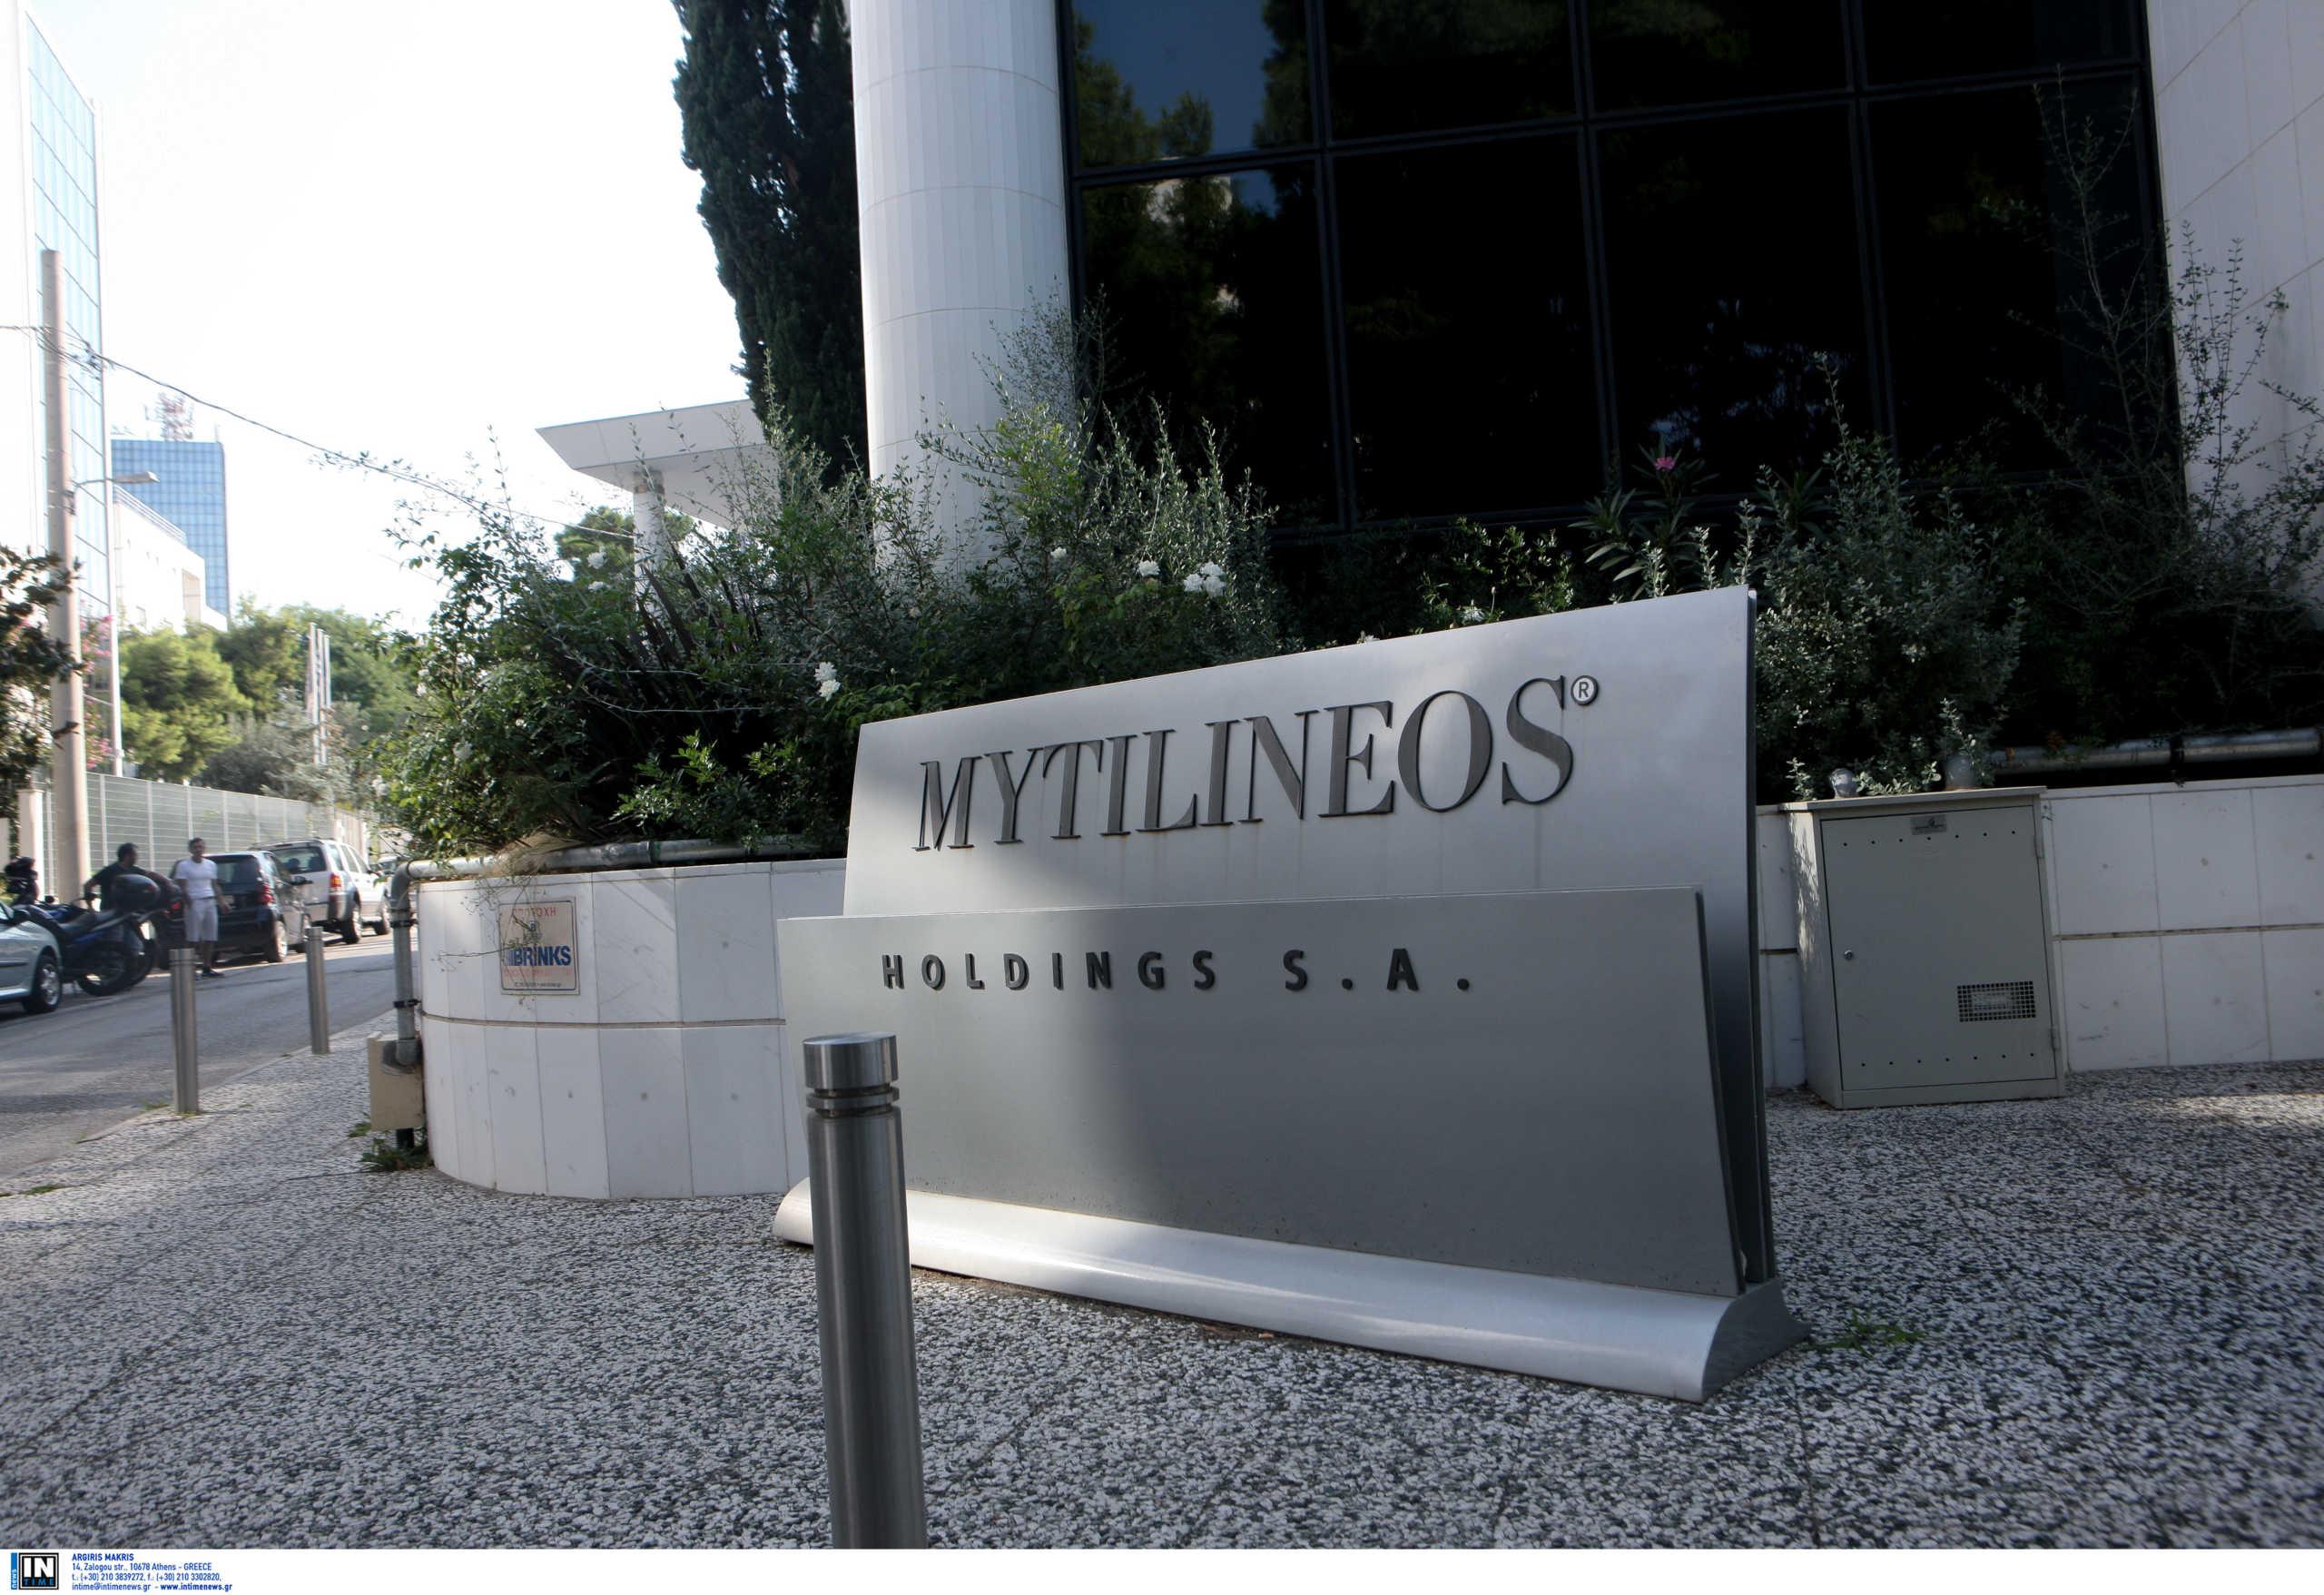 Mytilineos: Ανέλαβε νέα ενεργειακά έργα στην Ιταλία